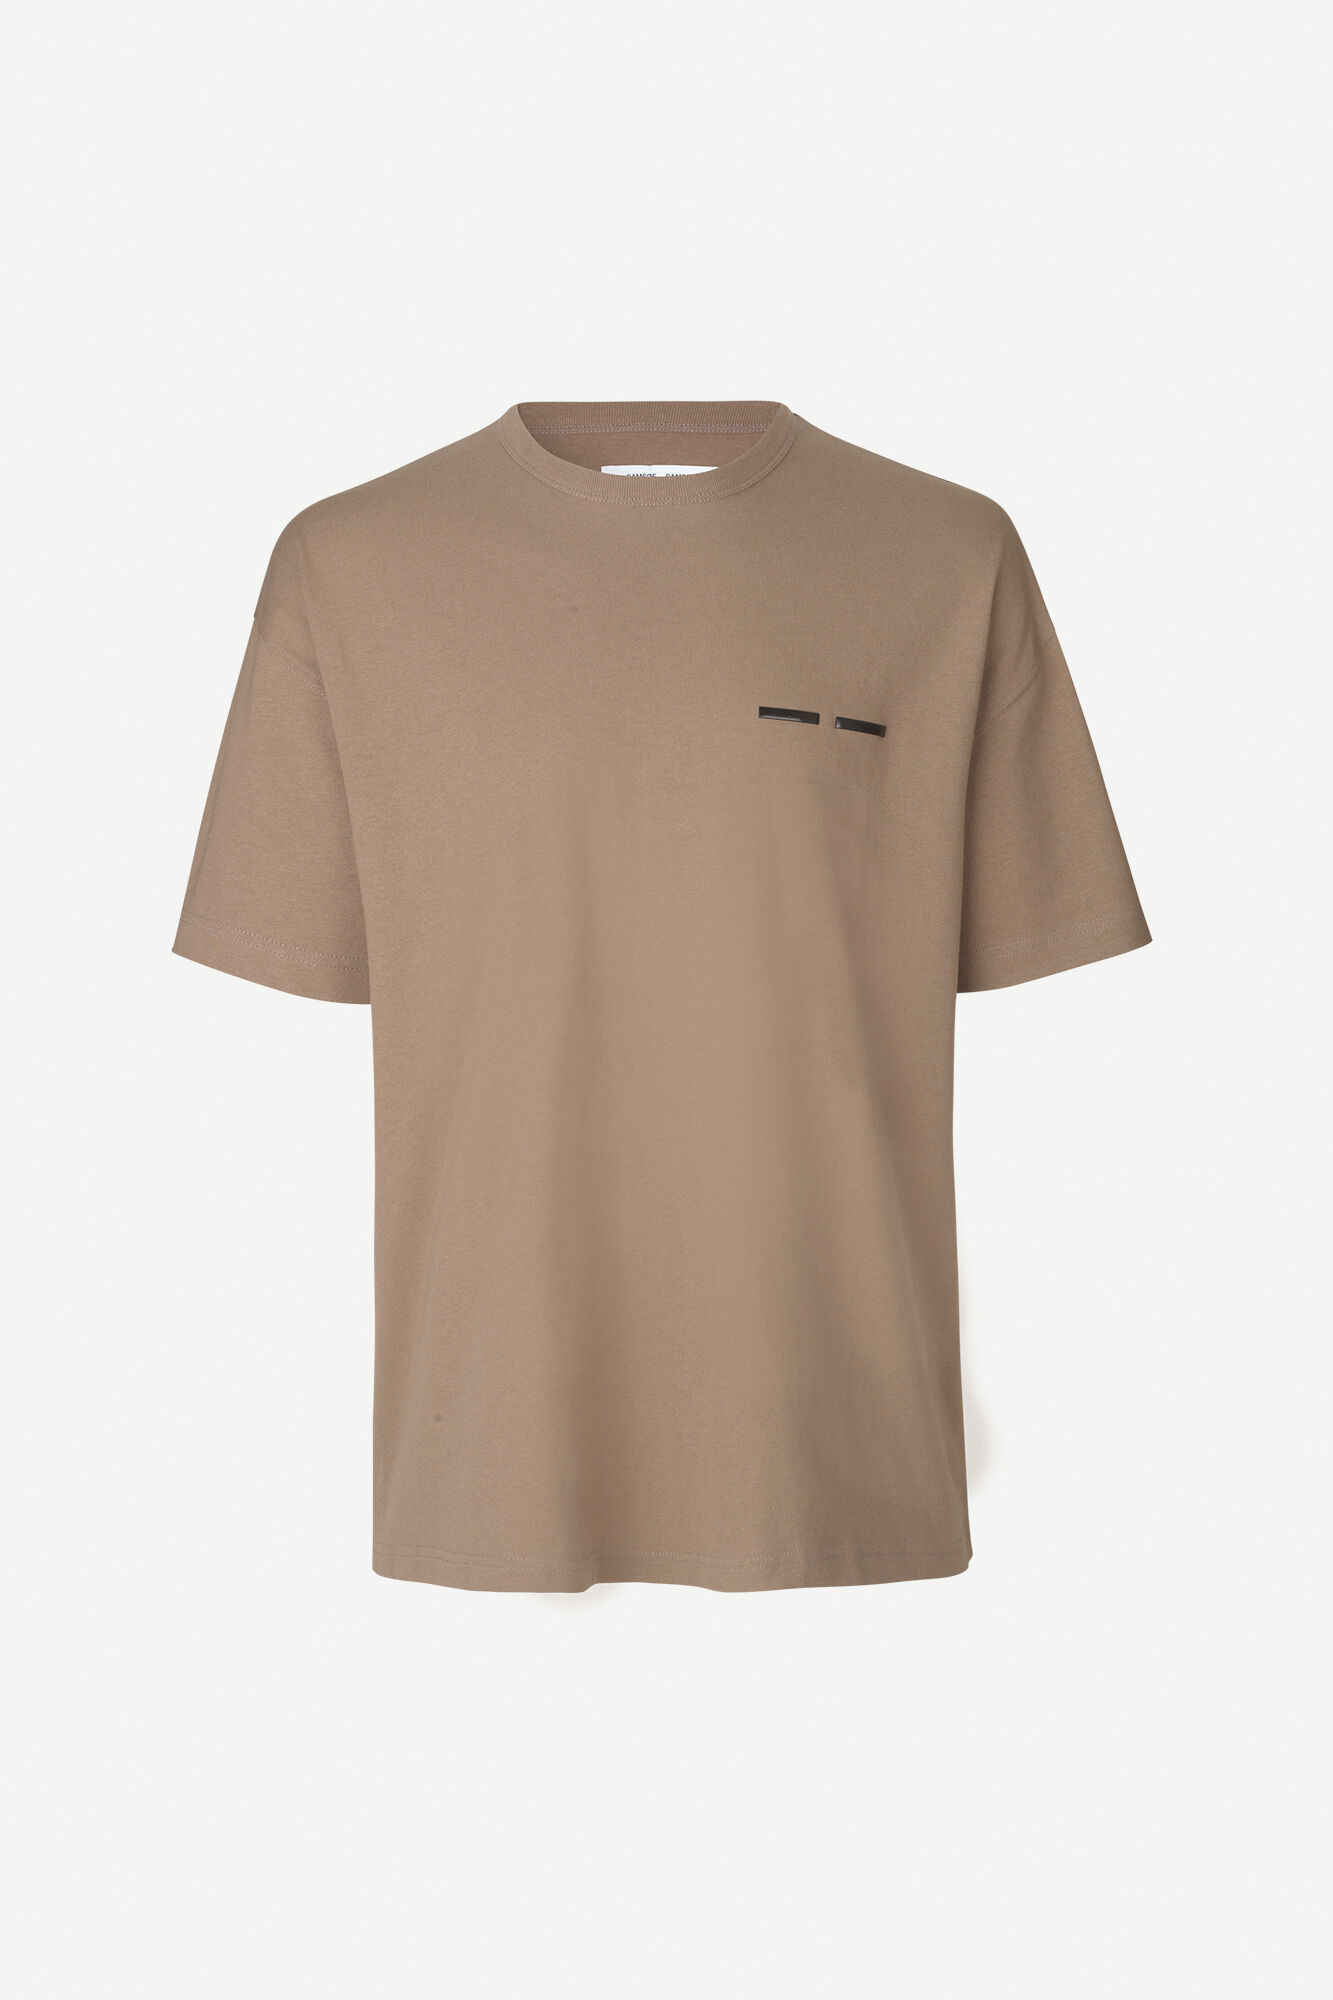 Toscan T-Shirt Shiitake Brown 11415-1